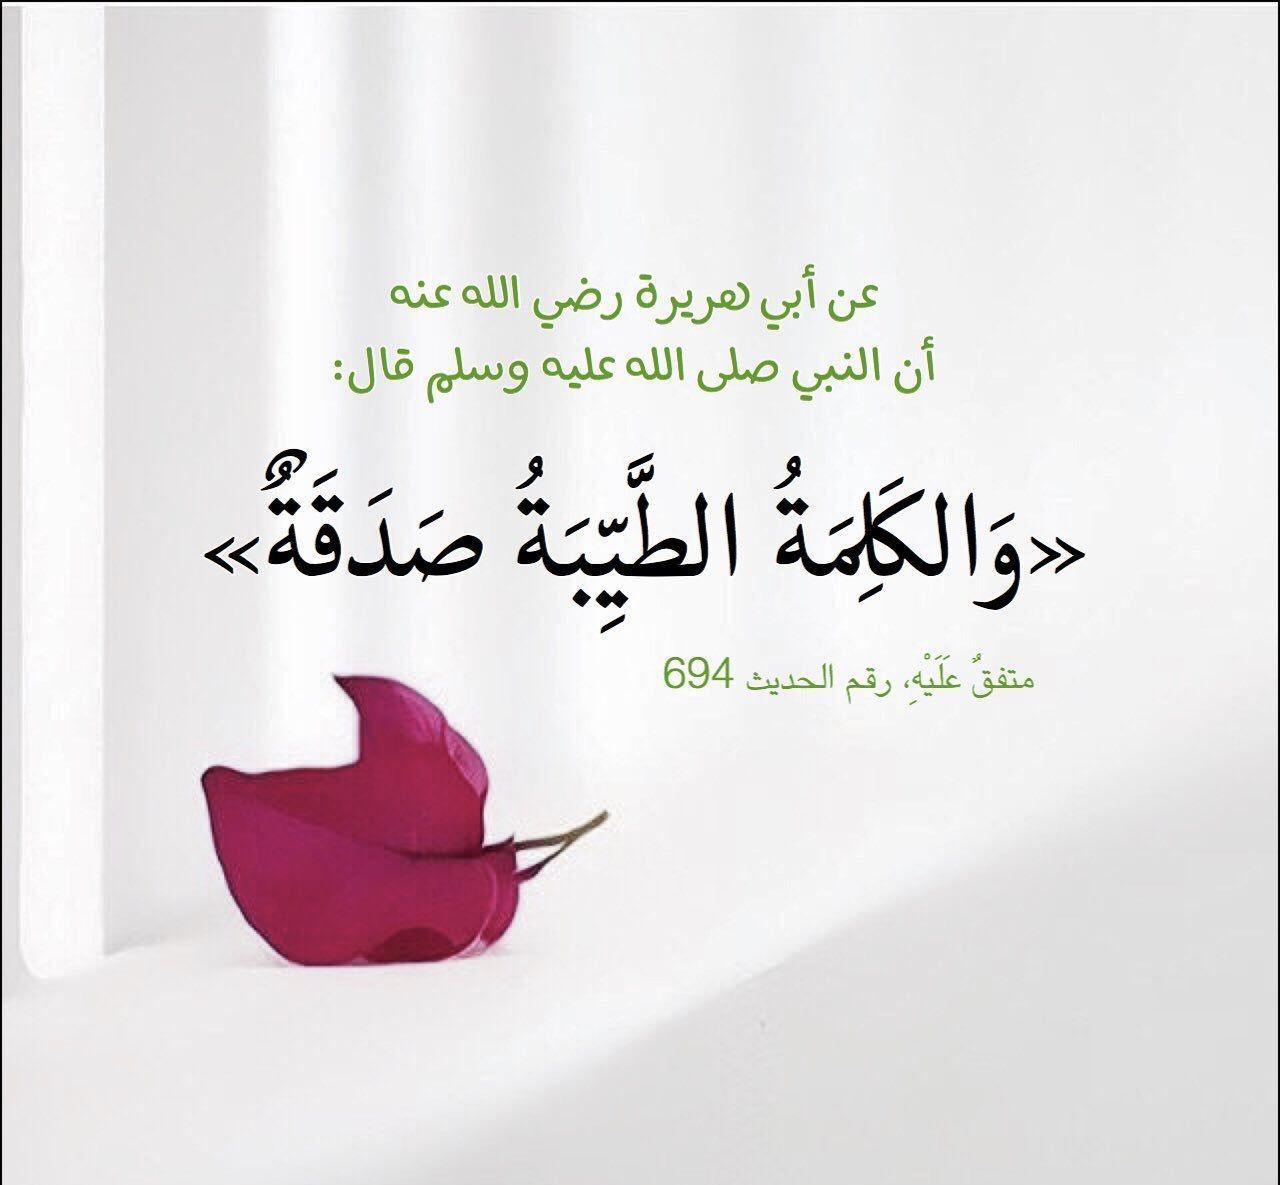 Pin By Abdulrahman Alghamdi On الد ين الق ي م In 2020 Home Decor Decals Decor Home Decor